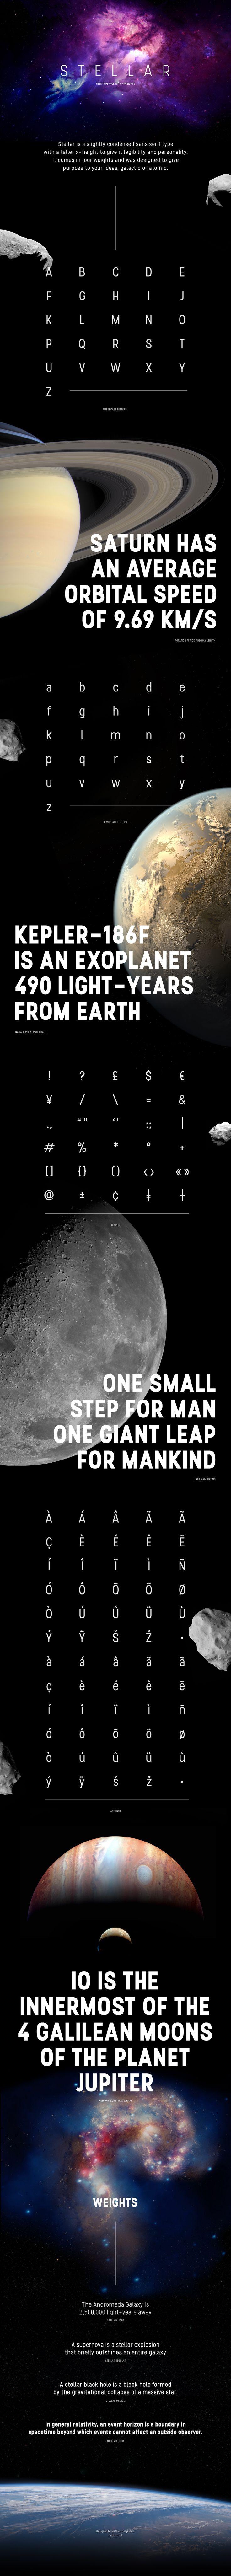 Stellar - Free Font on Behance